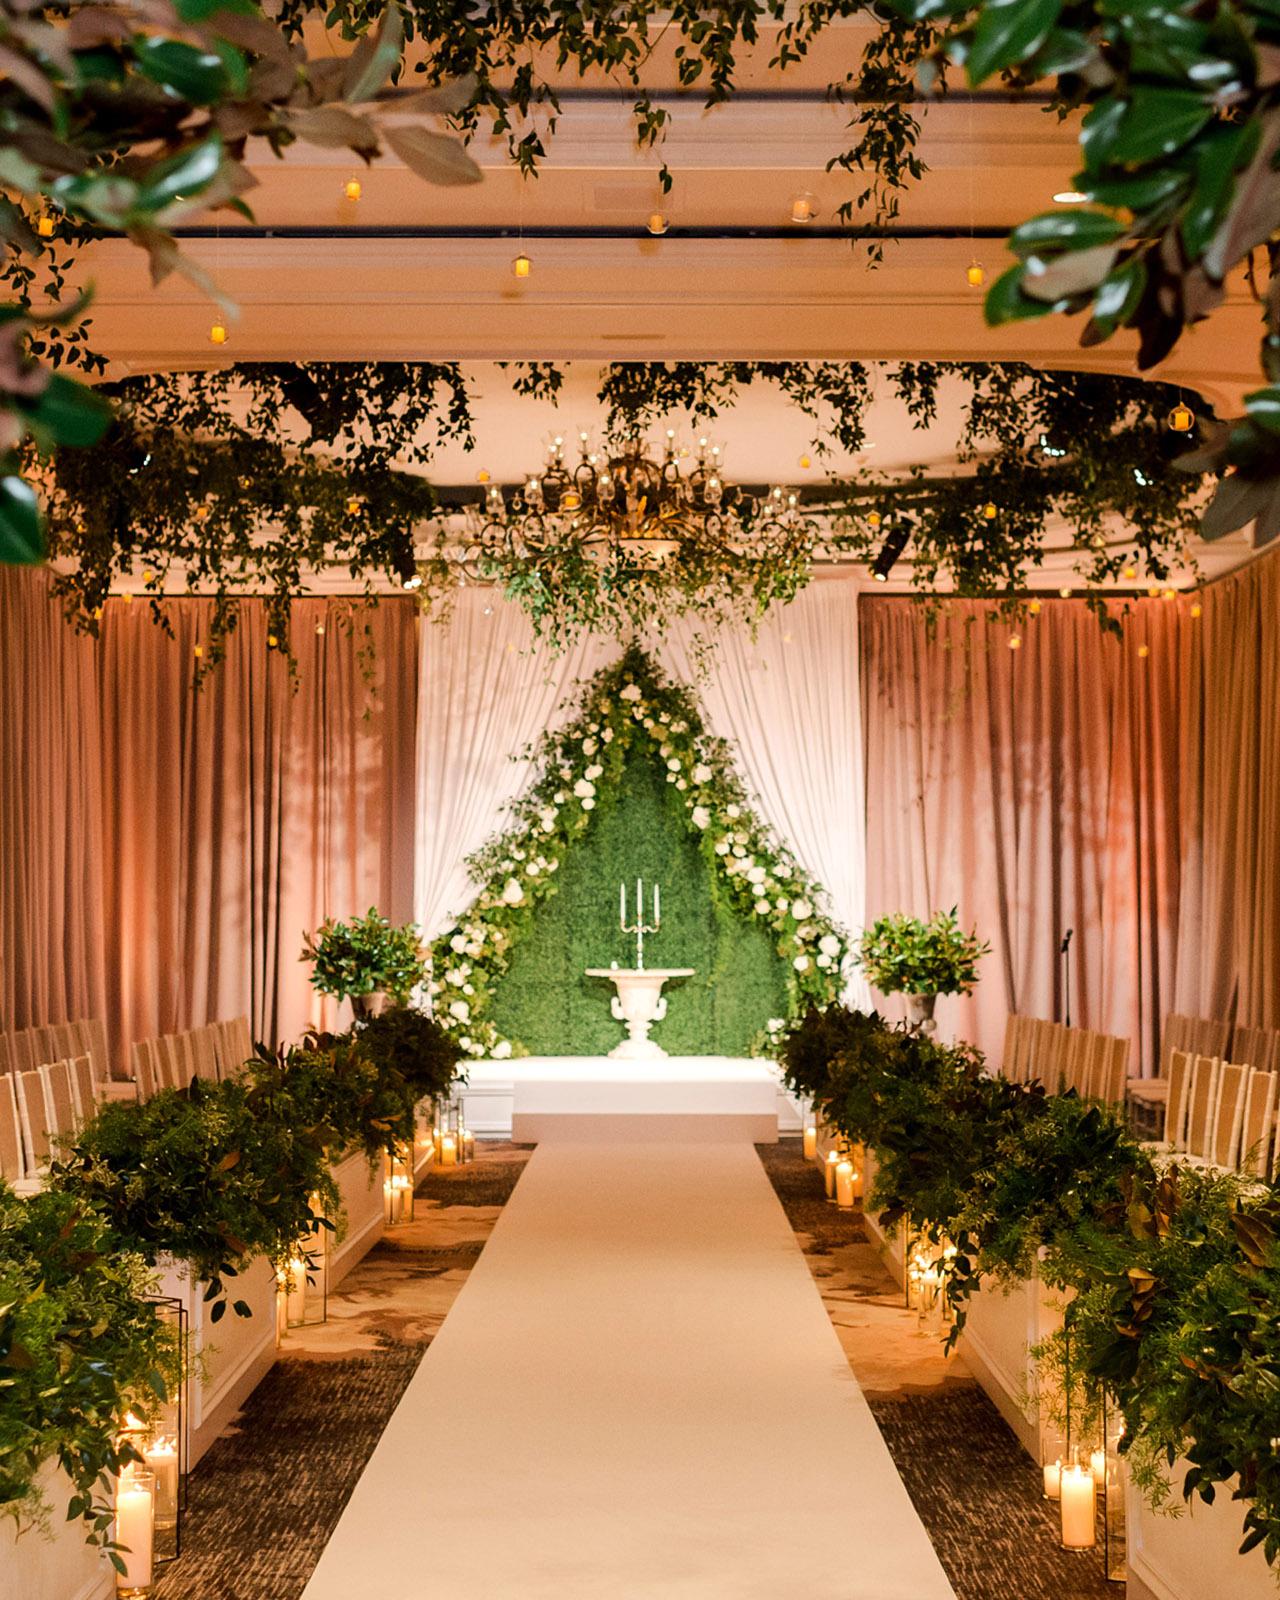 denita john wedding ceremony space